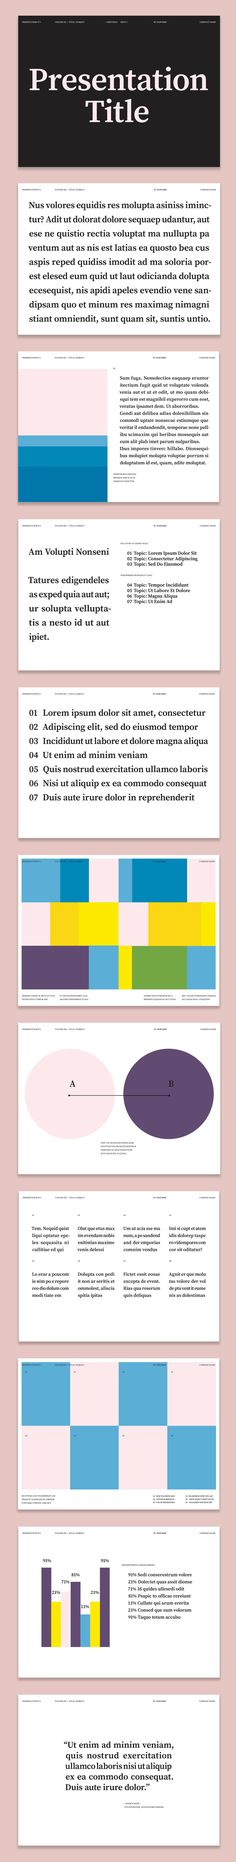 Colorful Presentation Layout – Image | Adobe Stock